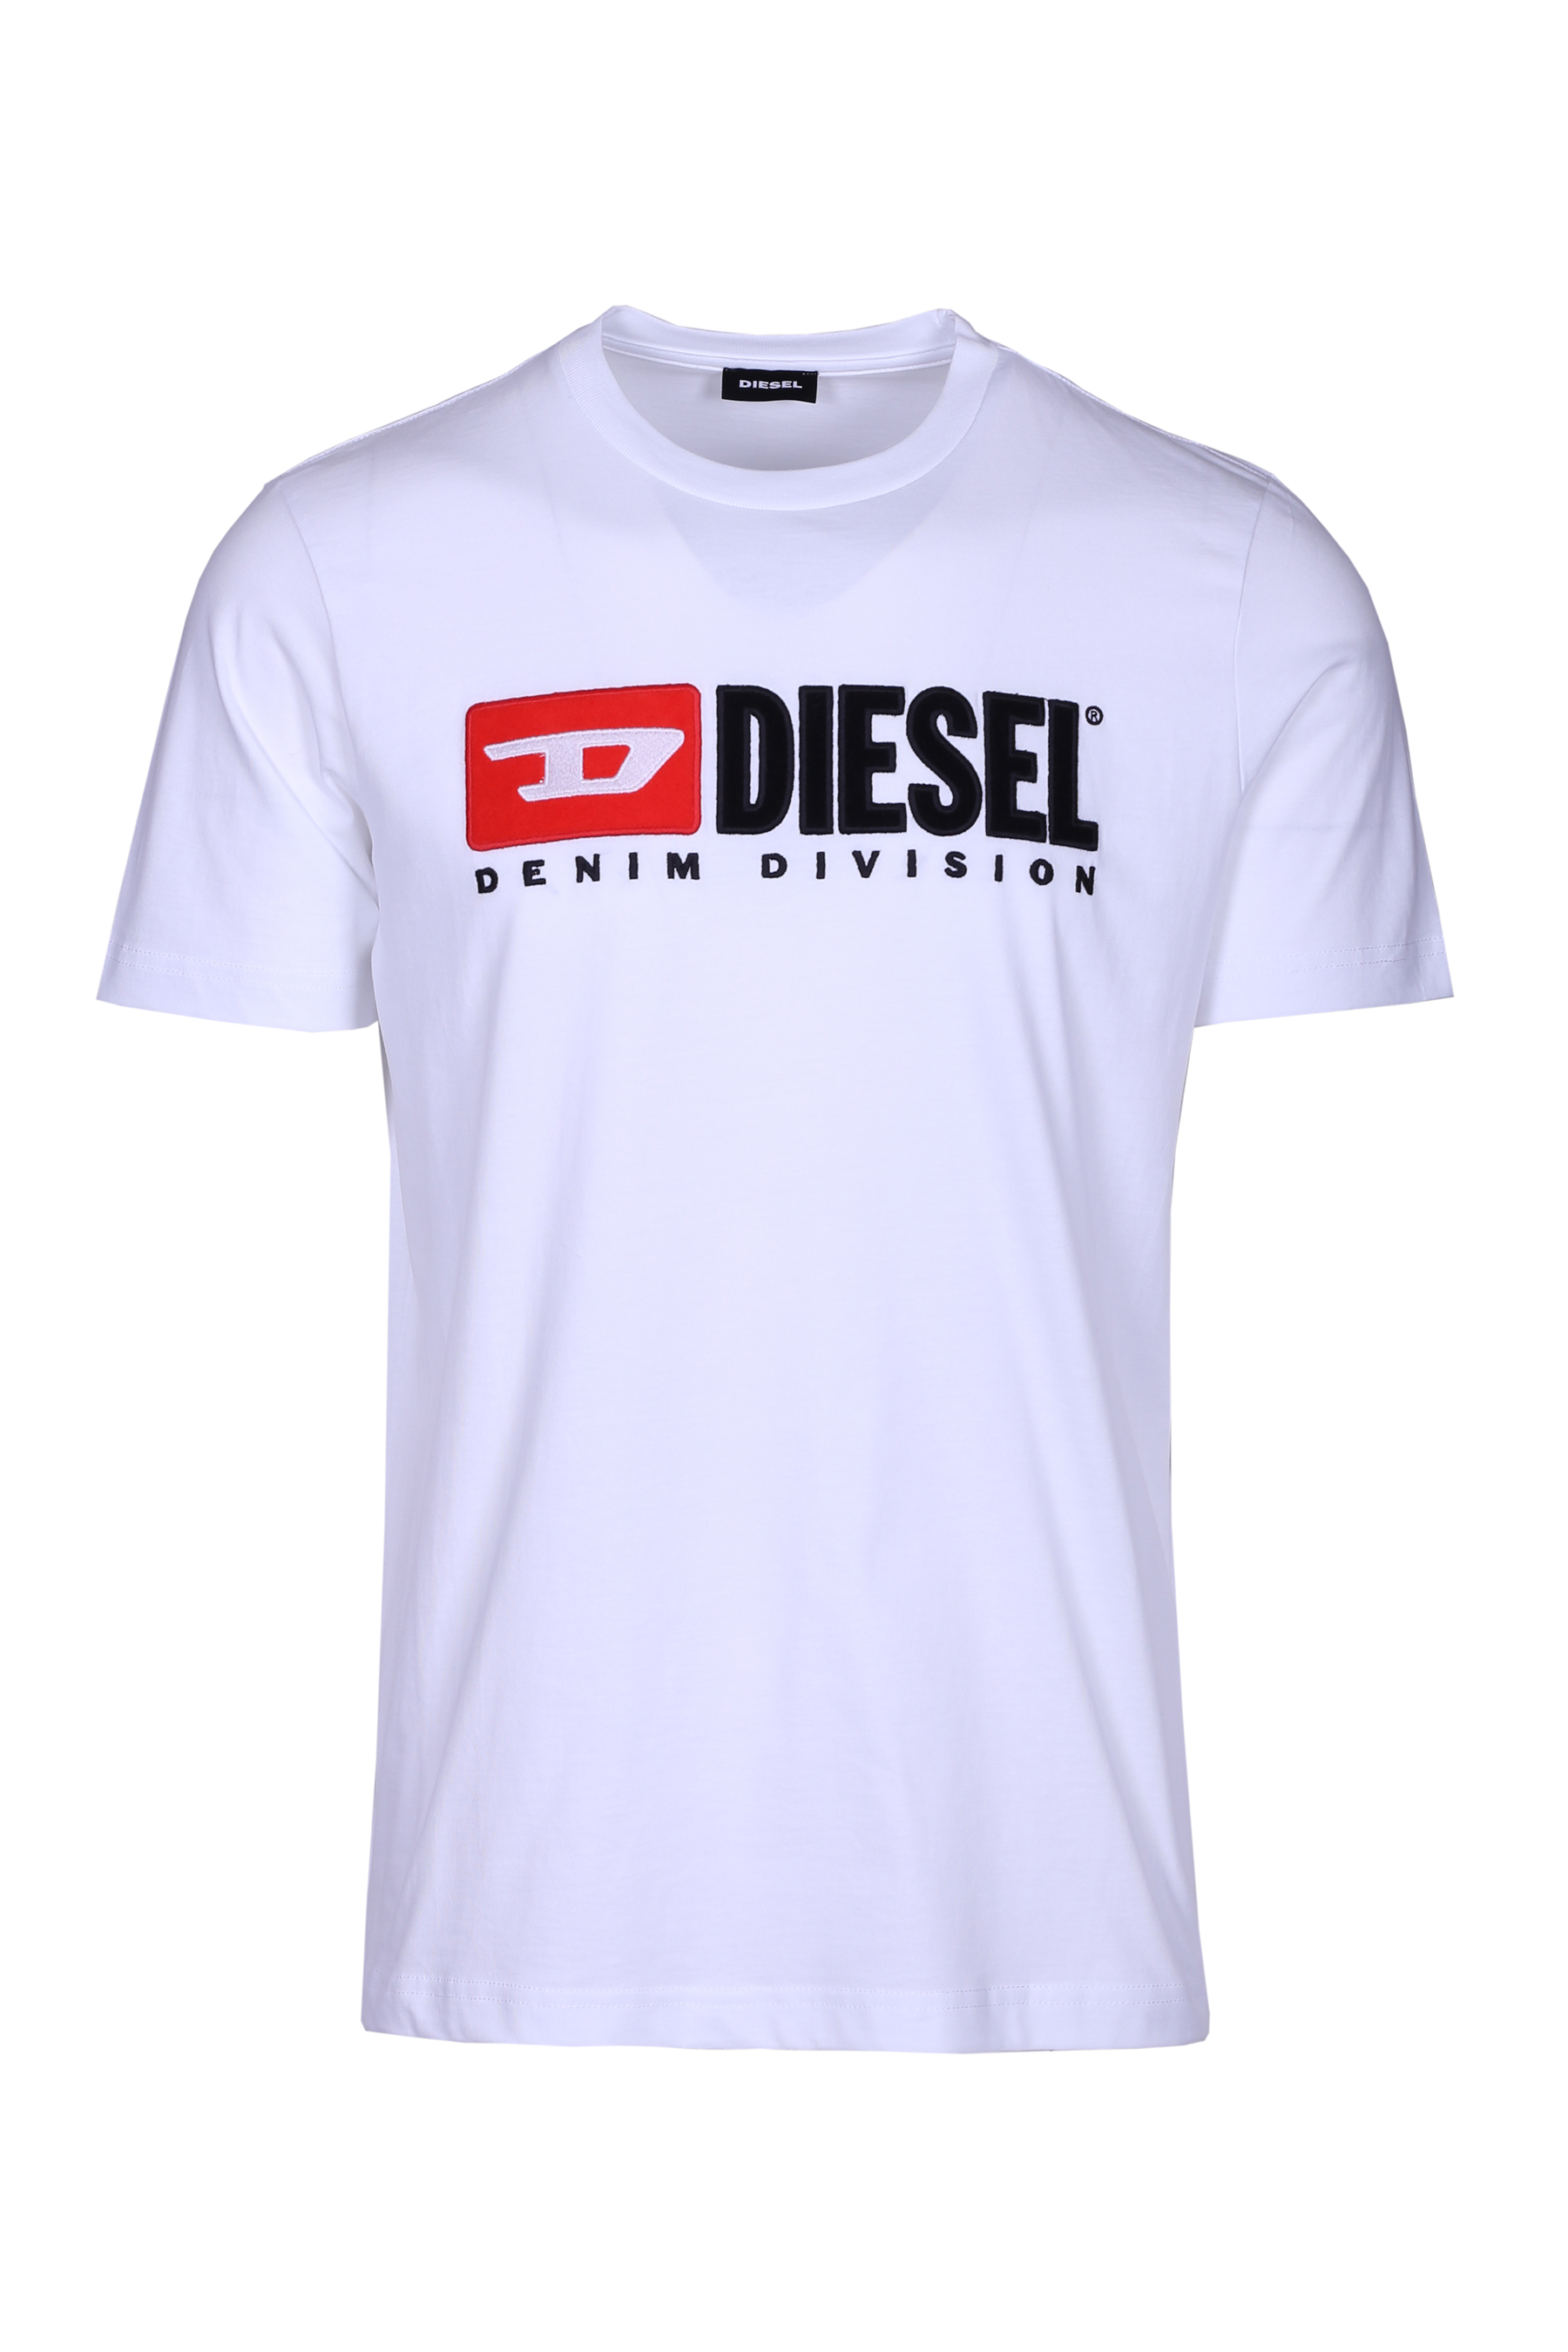 T-Shirt t-just-division. Diesel DIESEL |  | 00SH01 0CATJ100